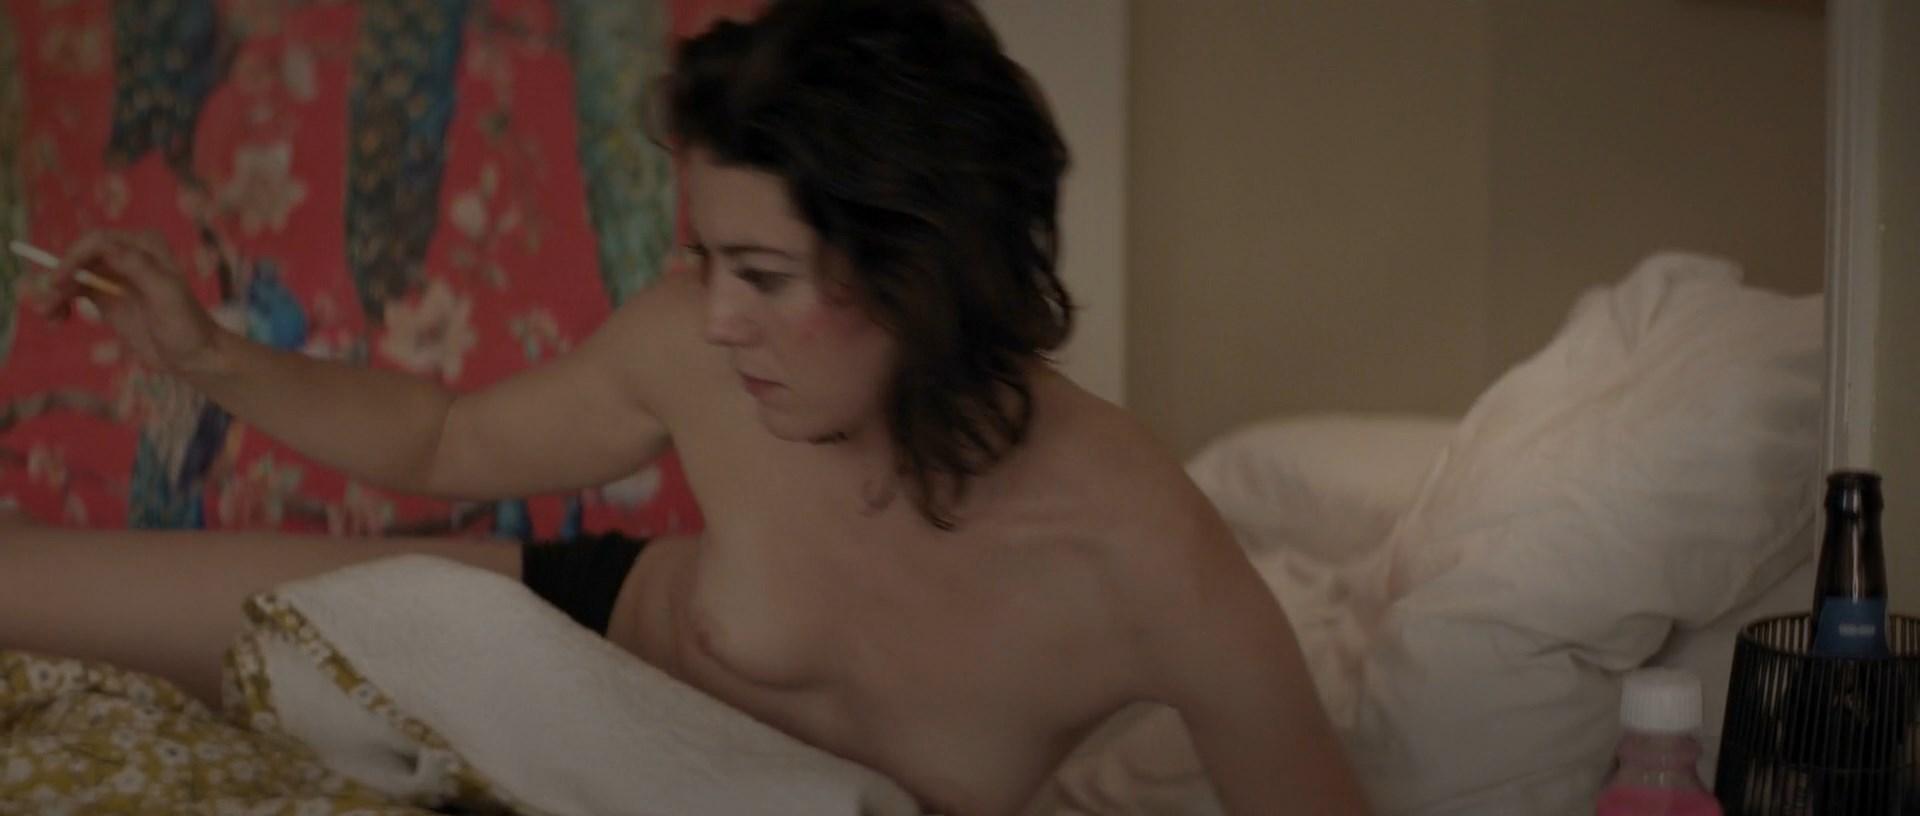 Mary Elizabeth Winstead nude - All About Nina (2018)